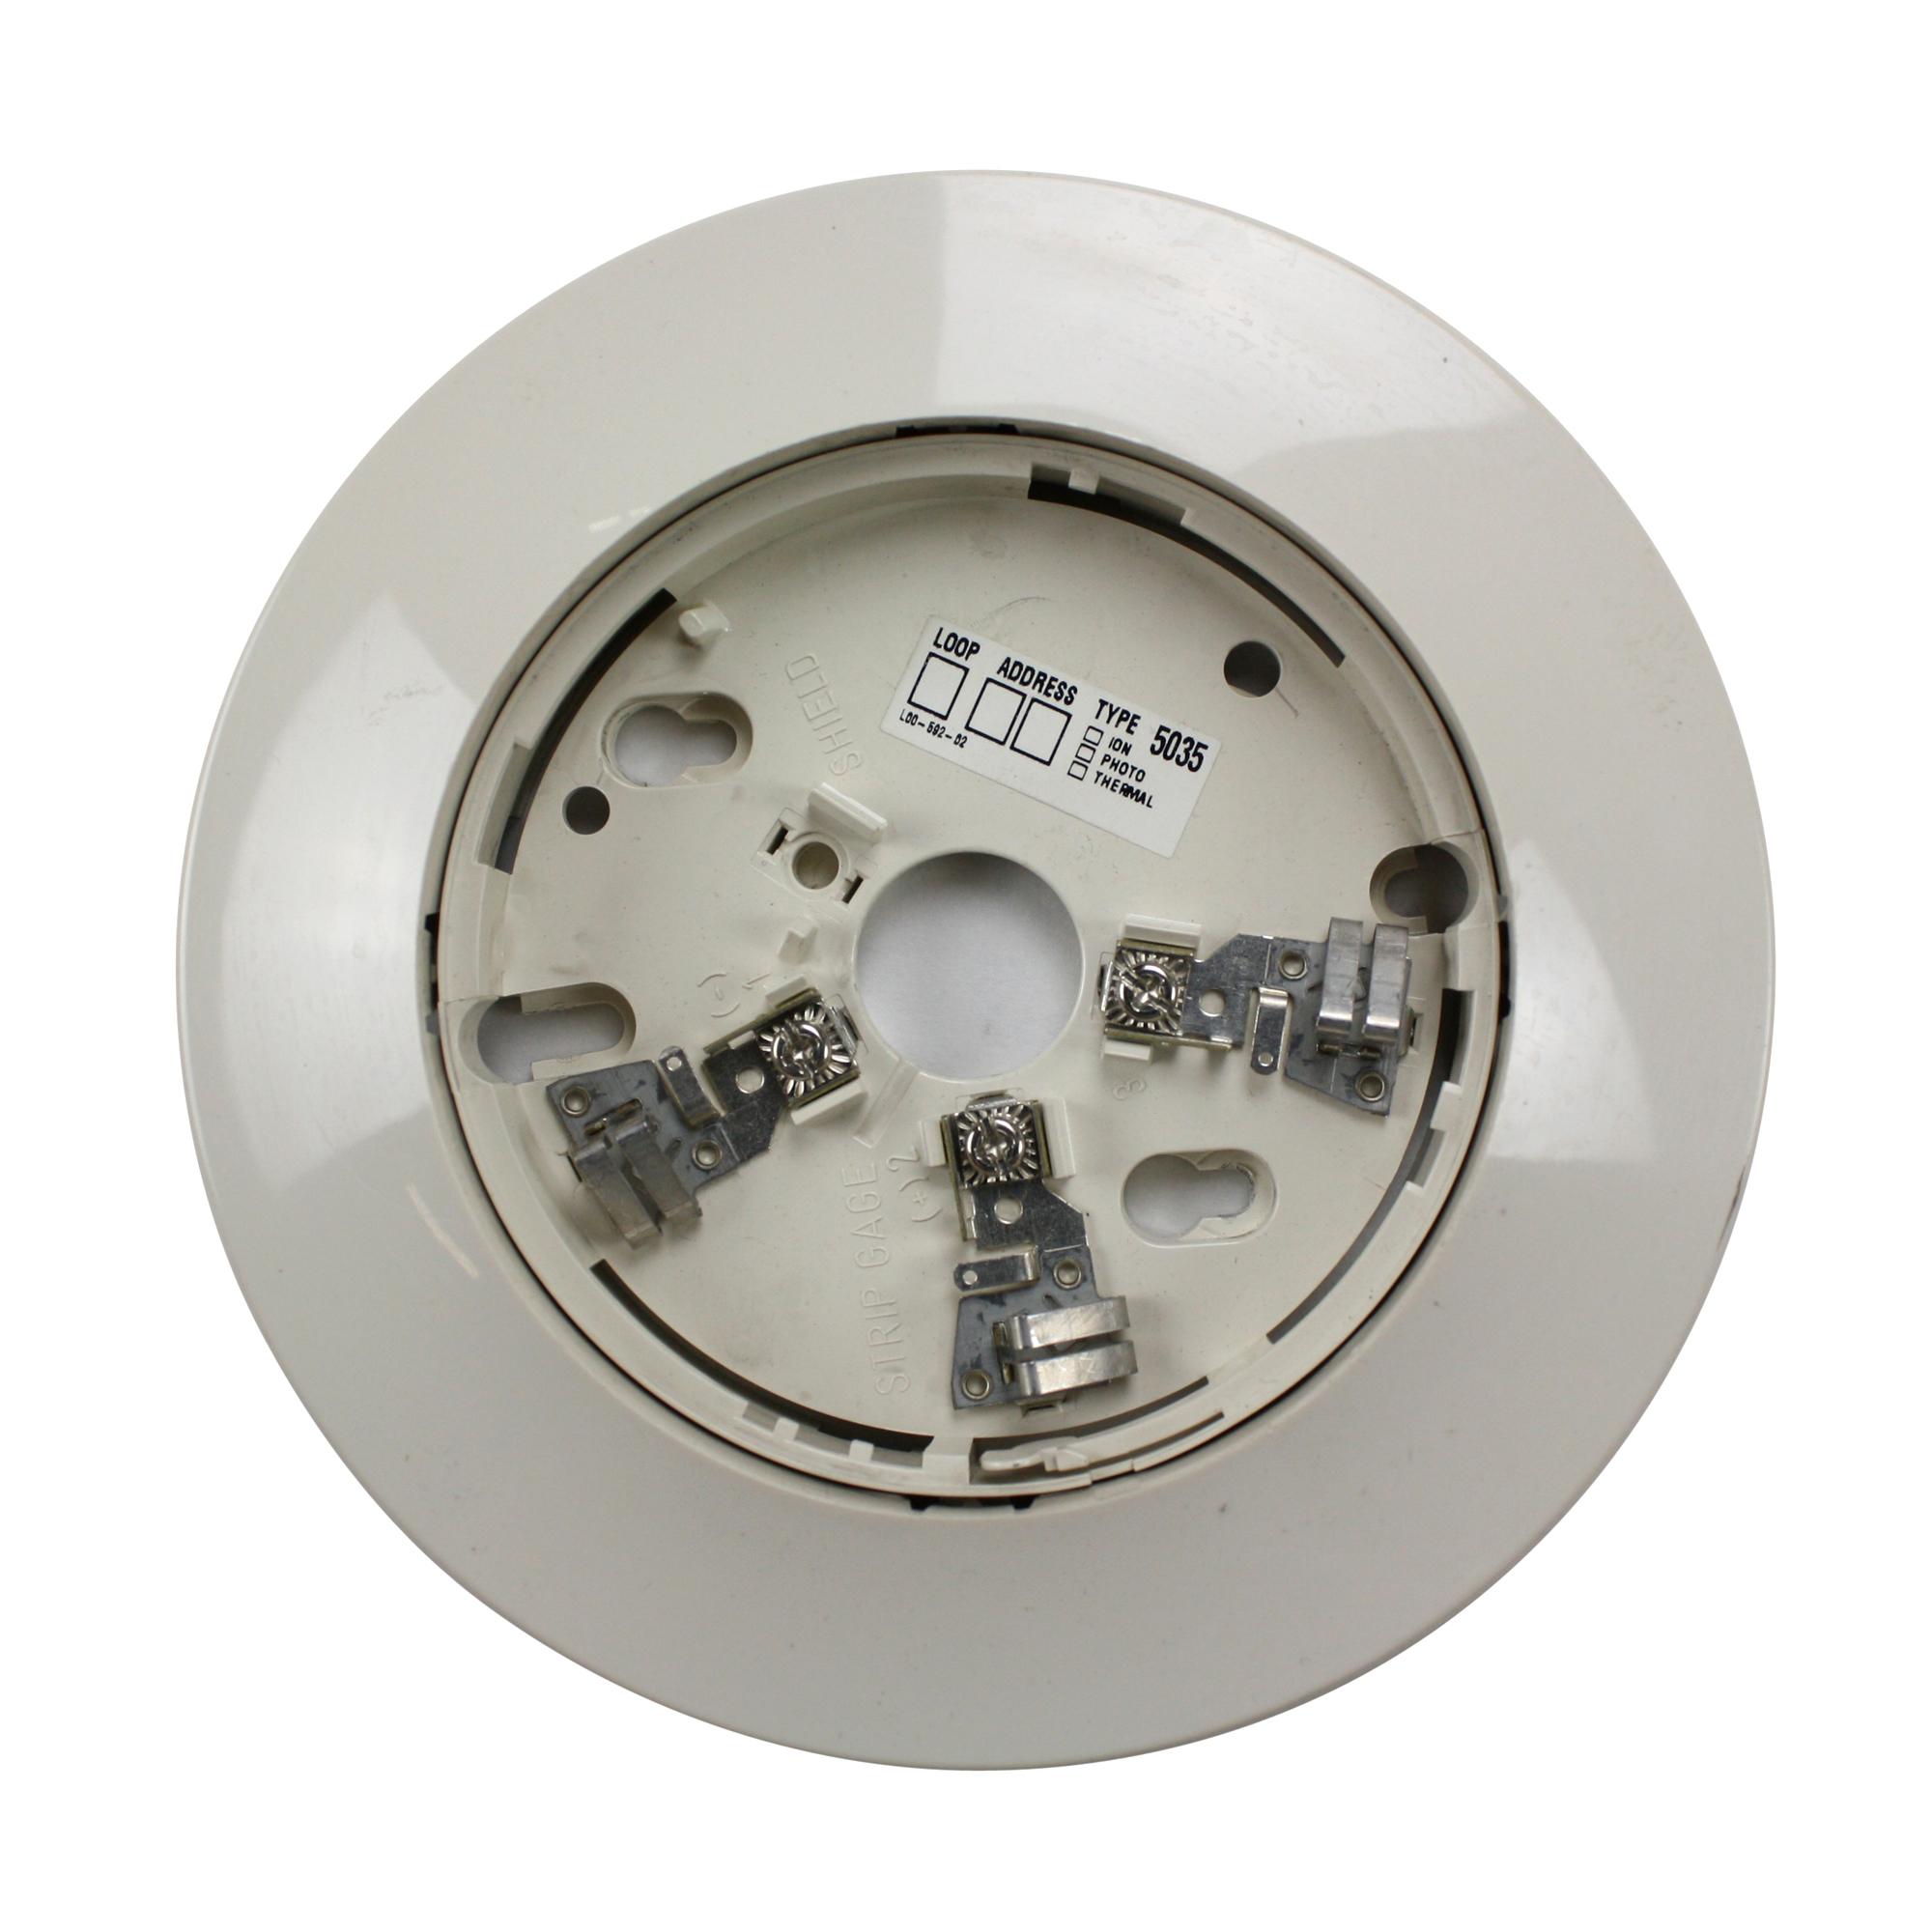 notifier honeywell b710lp fire alarm smoke detector base ebay. Black Bedroom Furniture Sets. Home Design Ideas